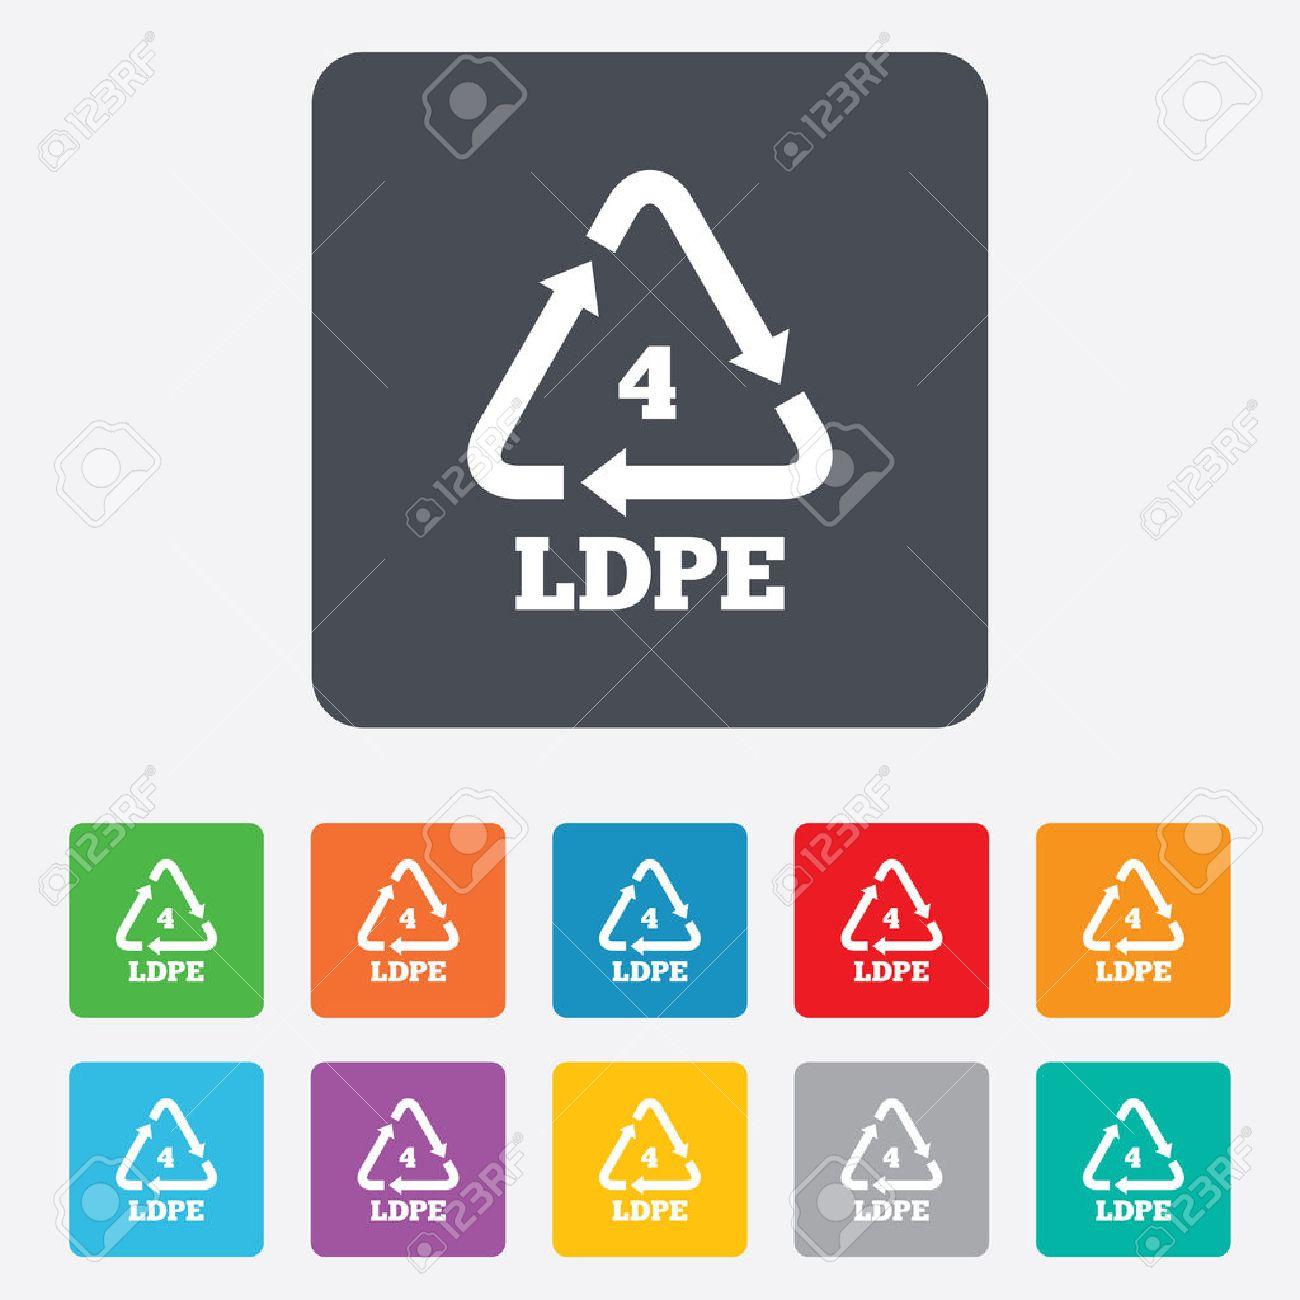 Ld pe 4 icon low density polyethylene sign recycling symbol ld pe 4 icon low density polyethylene sign recycling symbol rounded biocorpaavc Choice Image